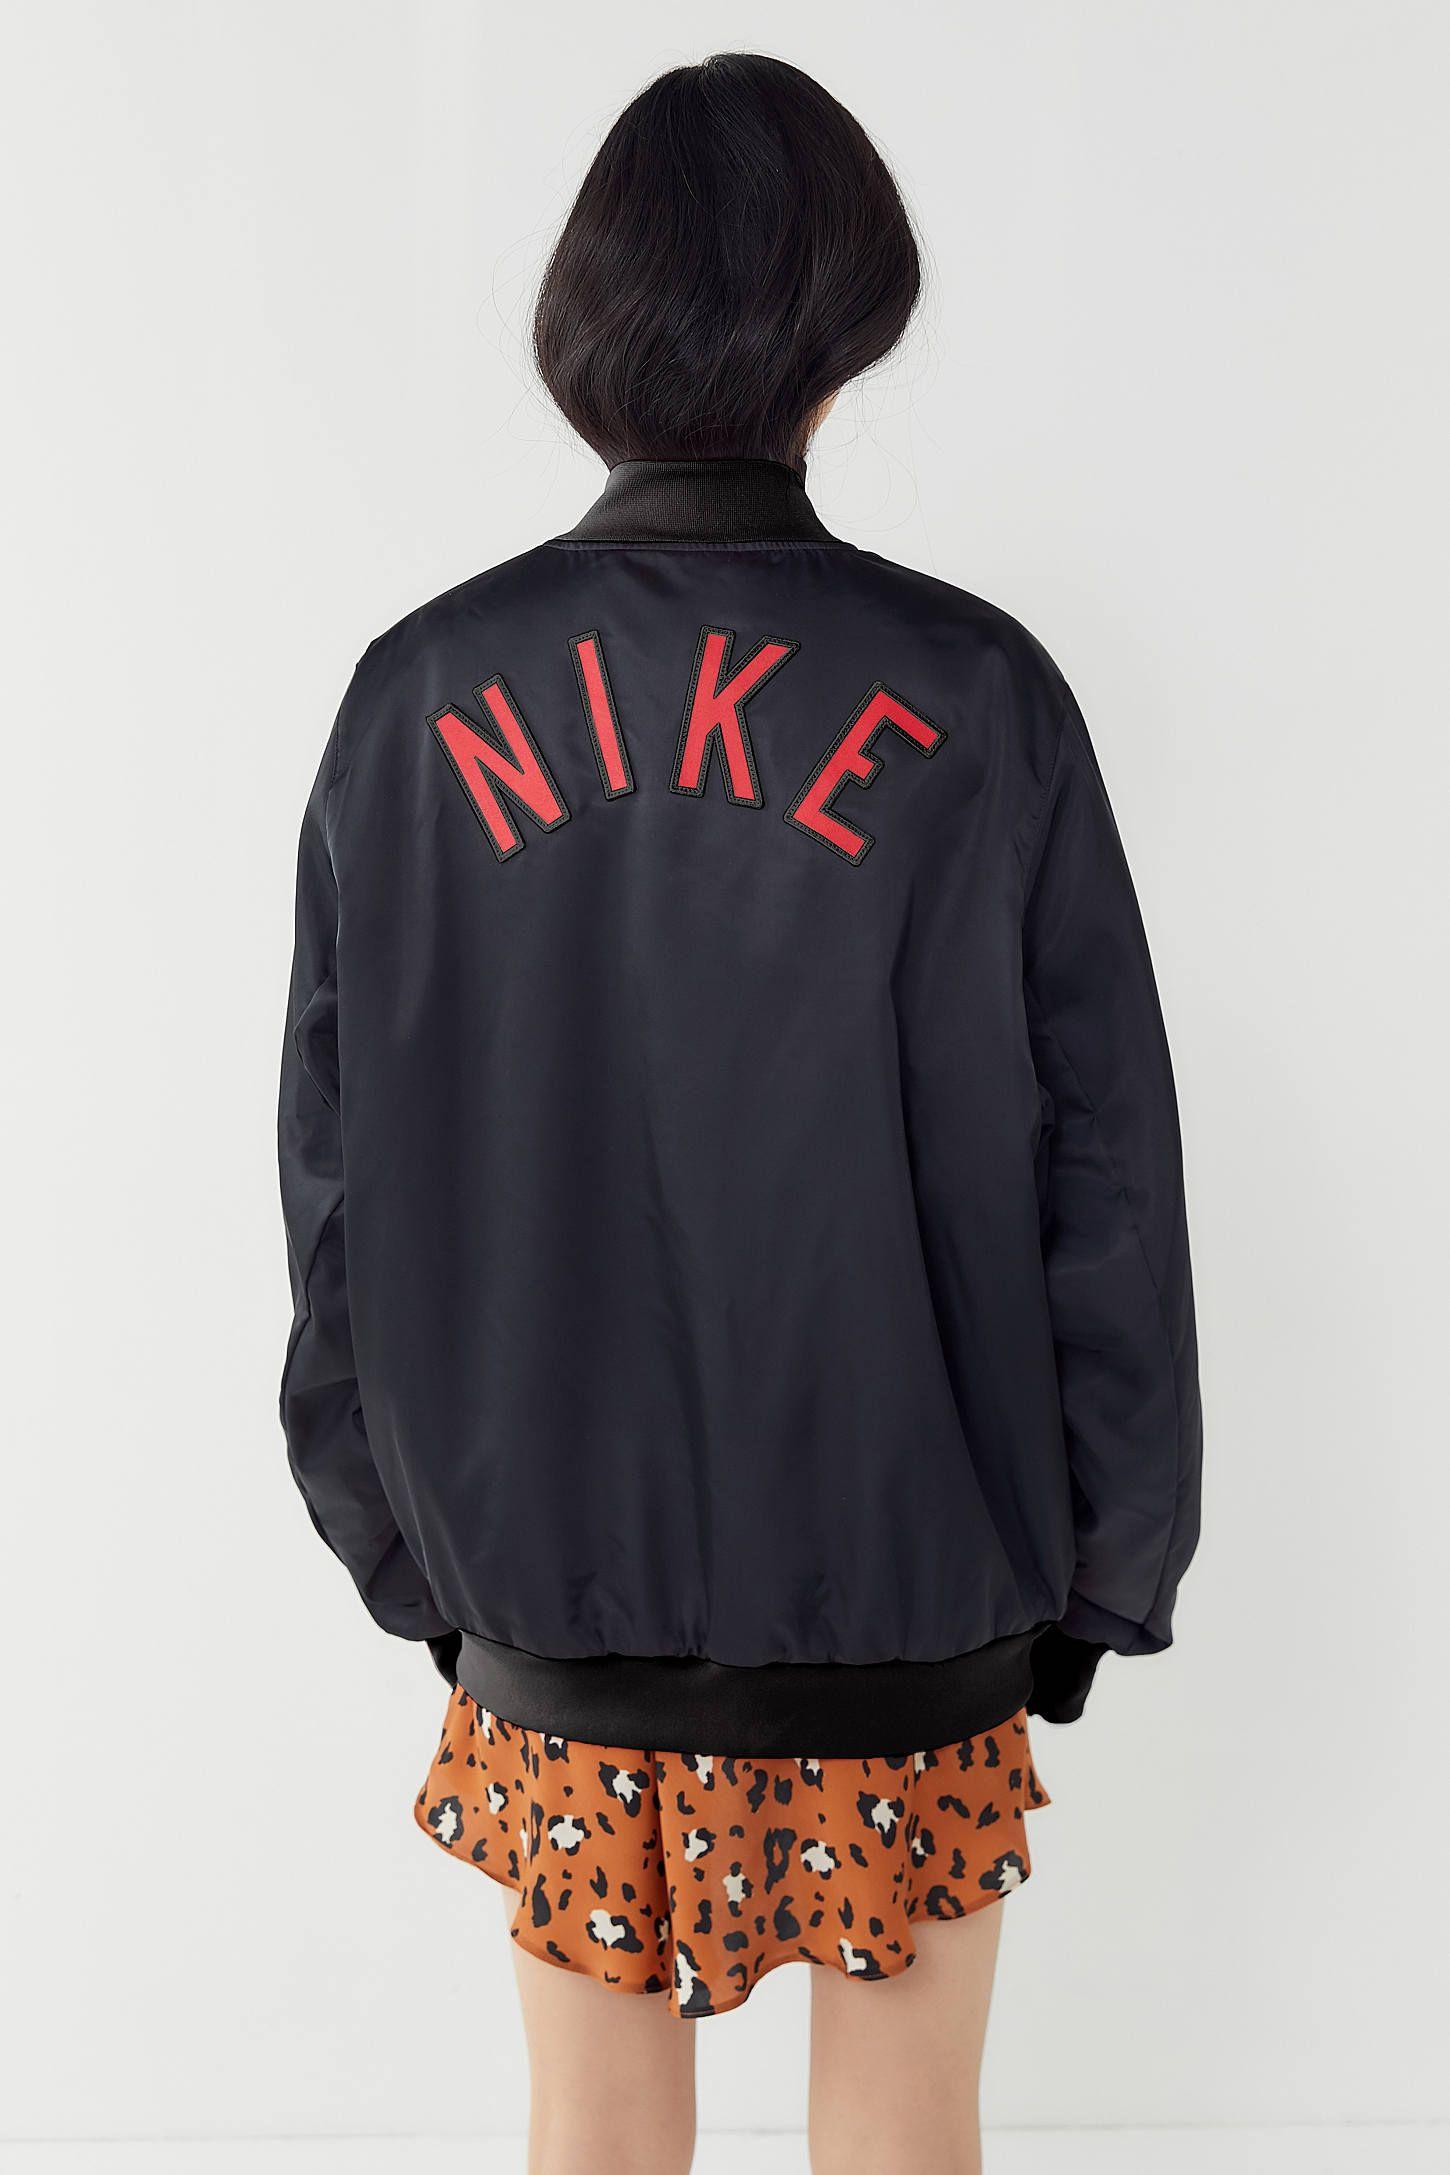 dabf7012105a Nike Sportswear Air Bomber Jacket in 2019